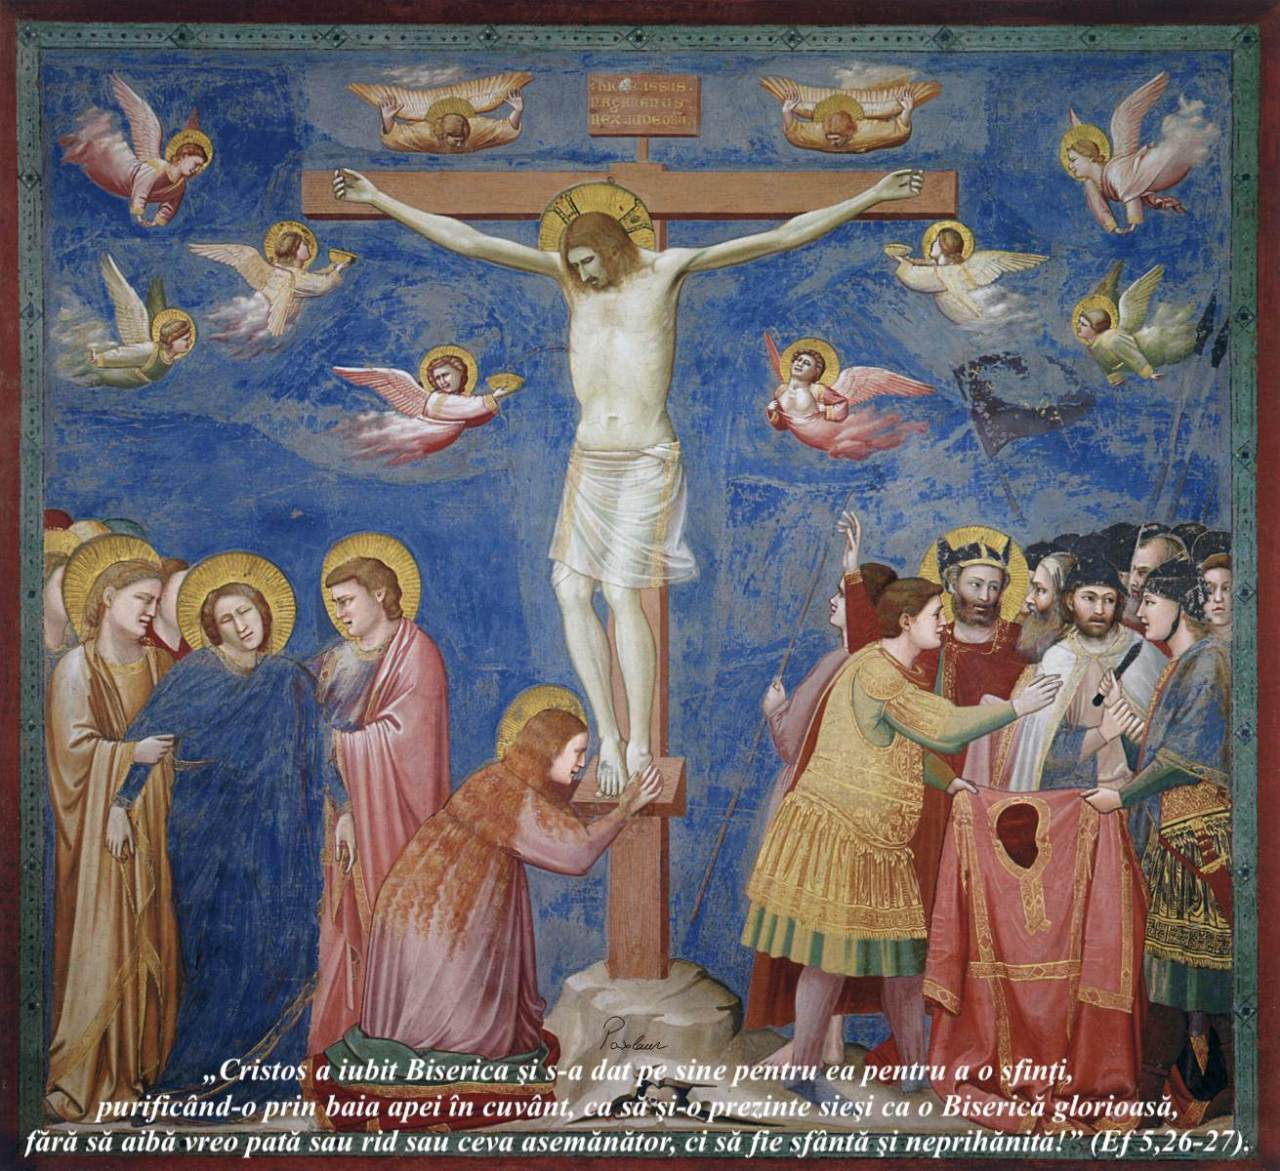 Cristoa a iubit Biserica